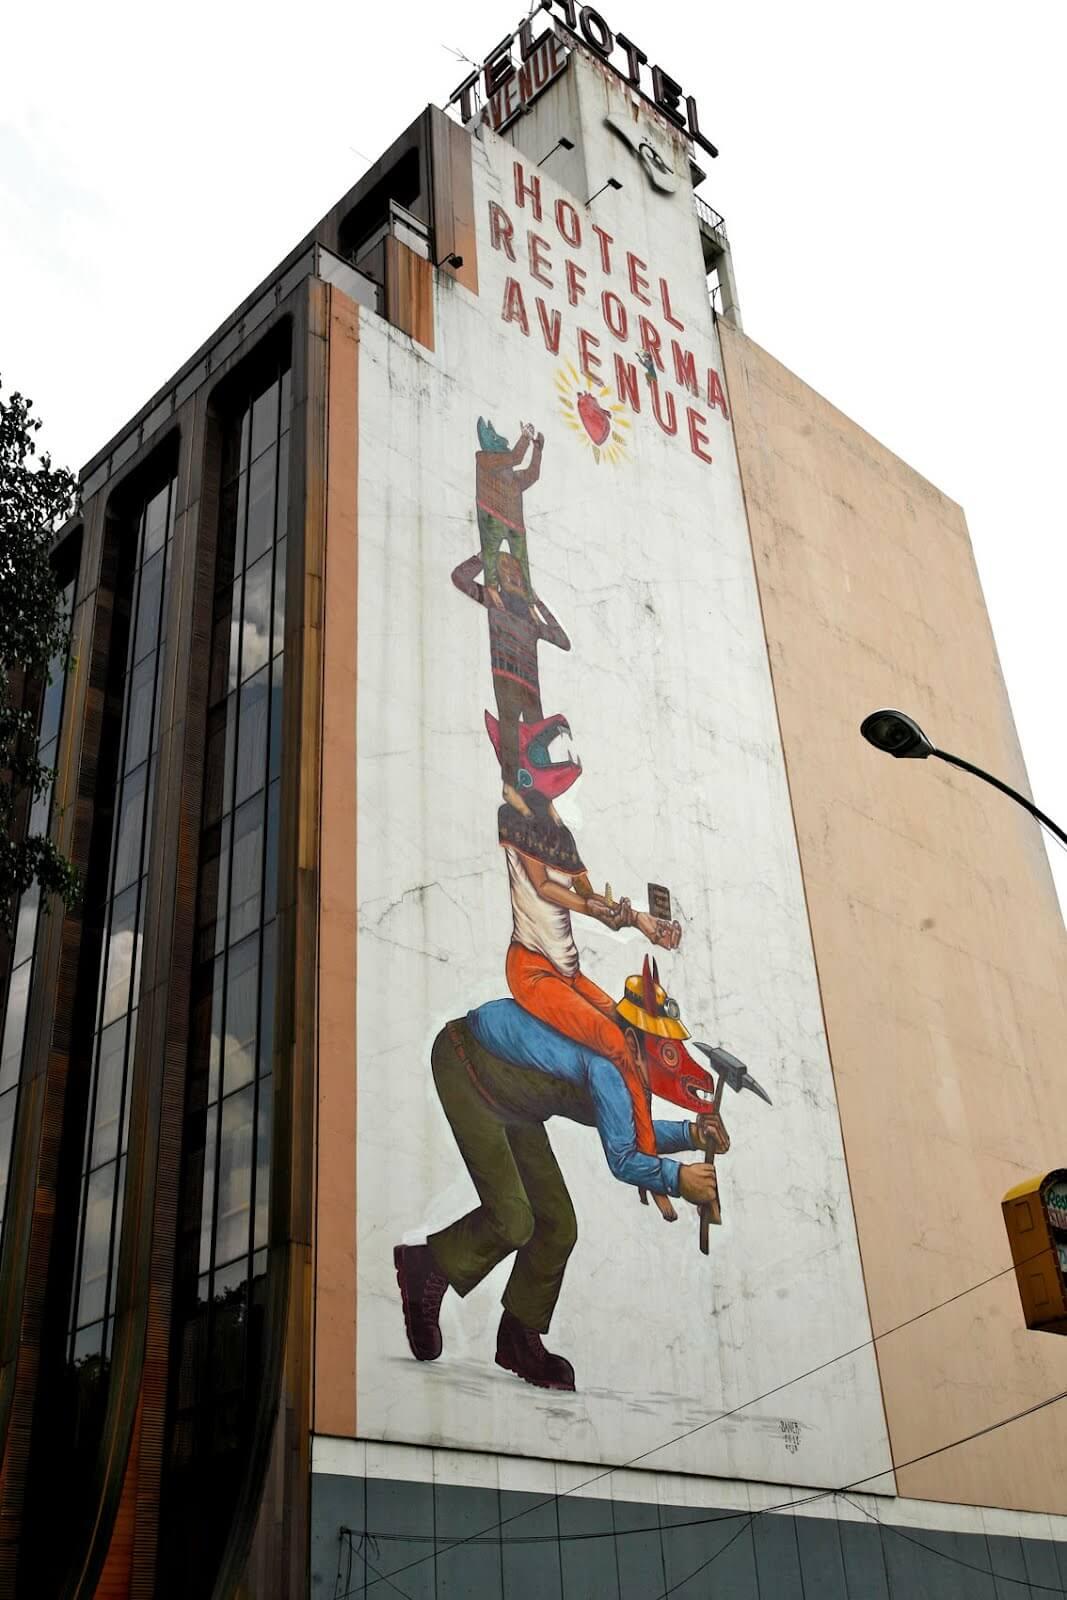 Personajes haciendo un totem sobre mural